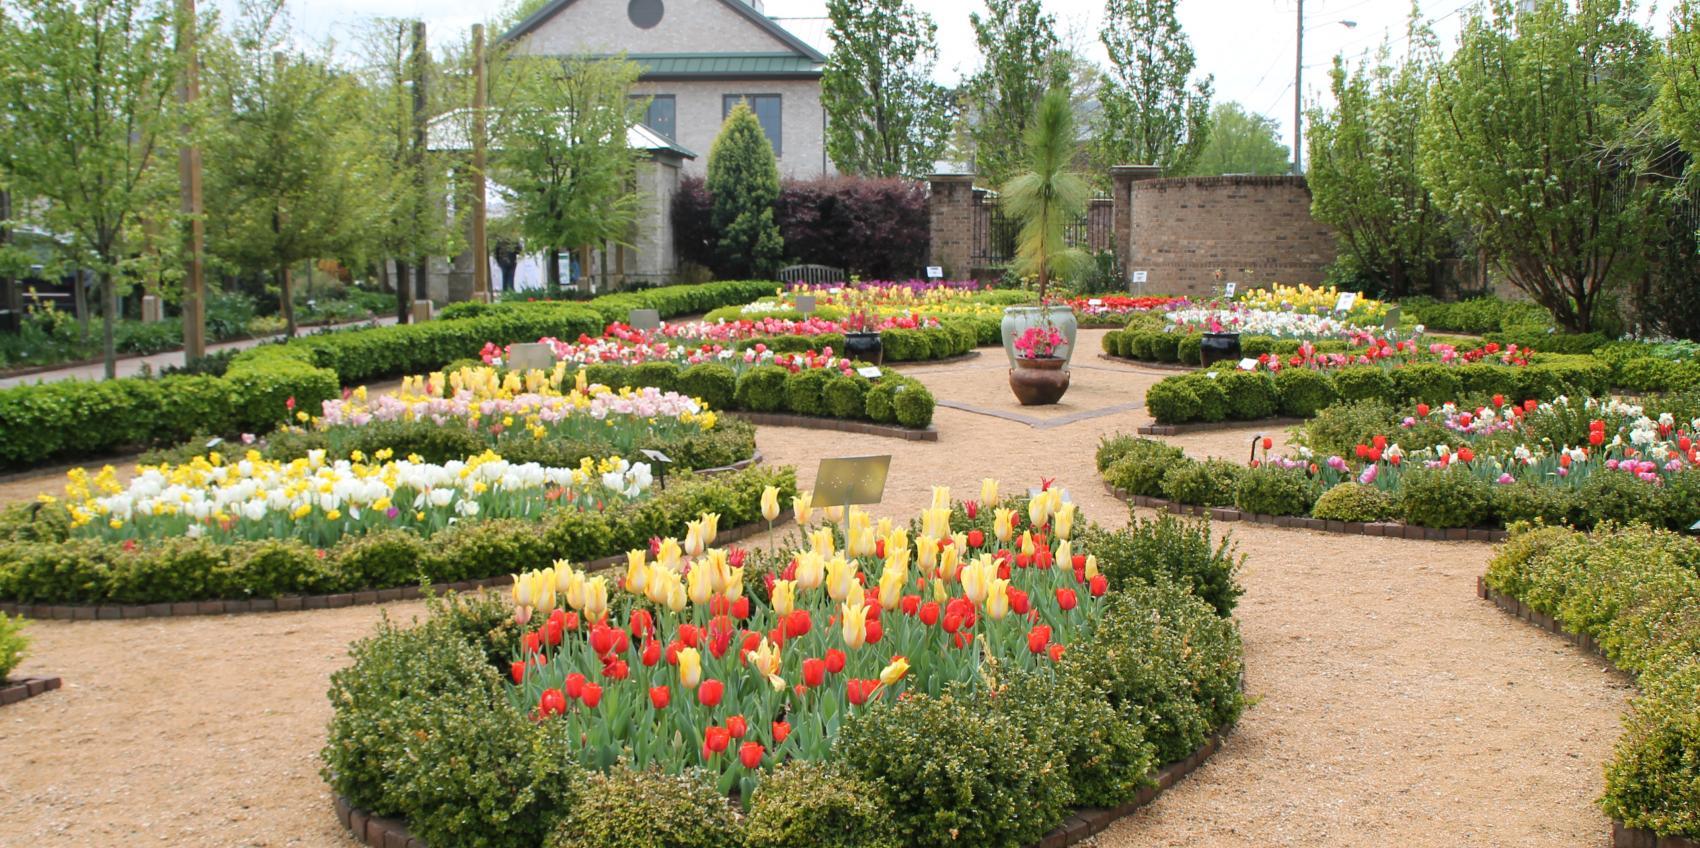 Paul j ciener botanical garden american public gardens for American garden association